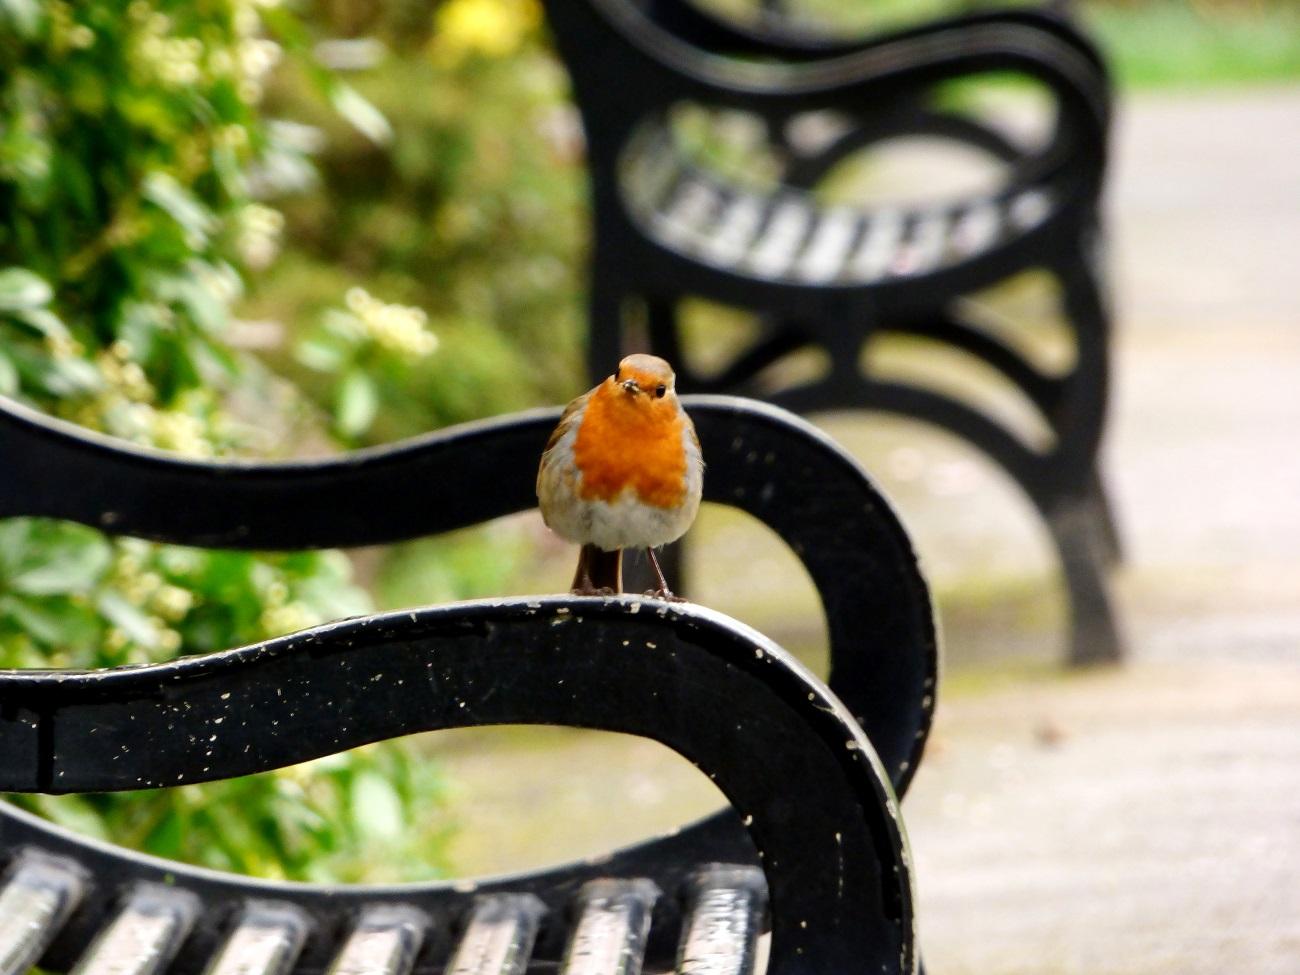 20170320_Tower-Hamlets_Grove-Hall-Park-Memorial-Garden_Dropping-in-to-say-hello